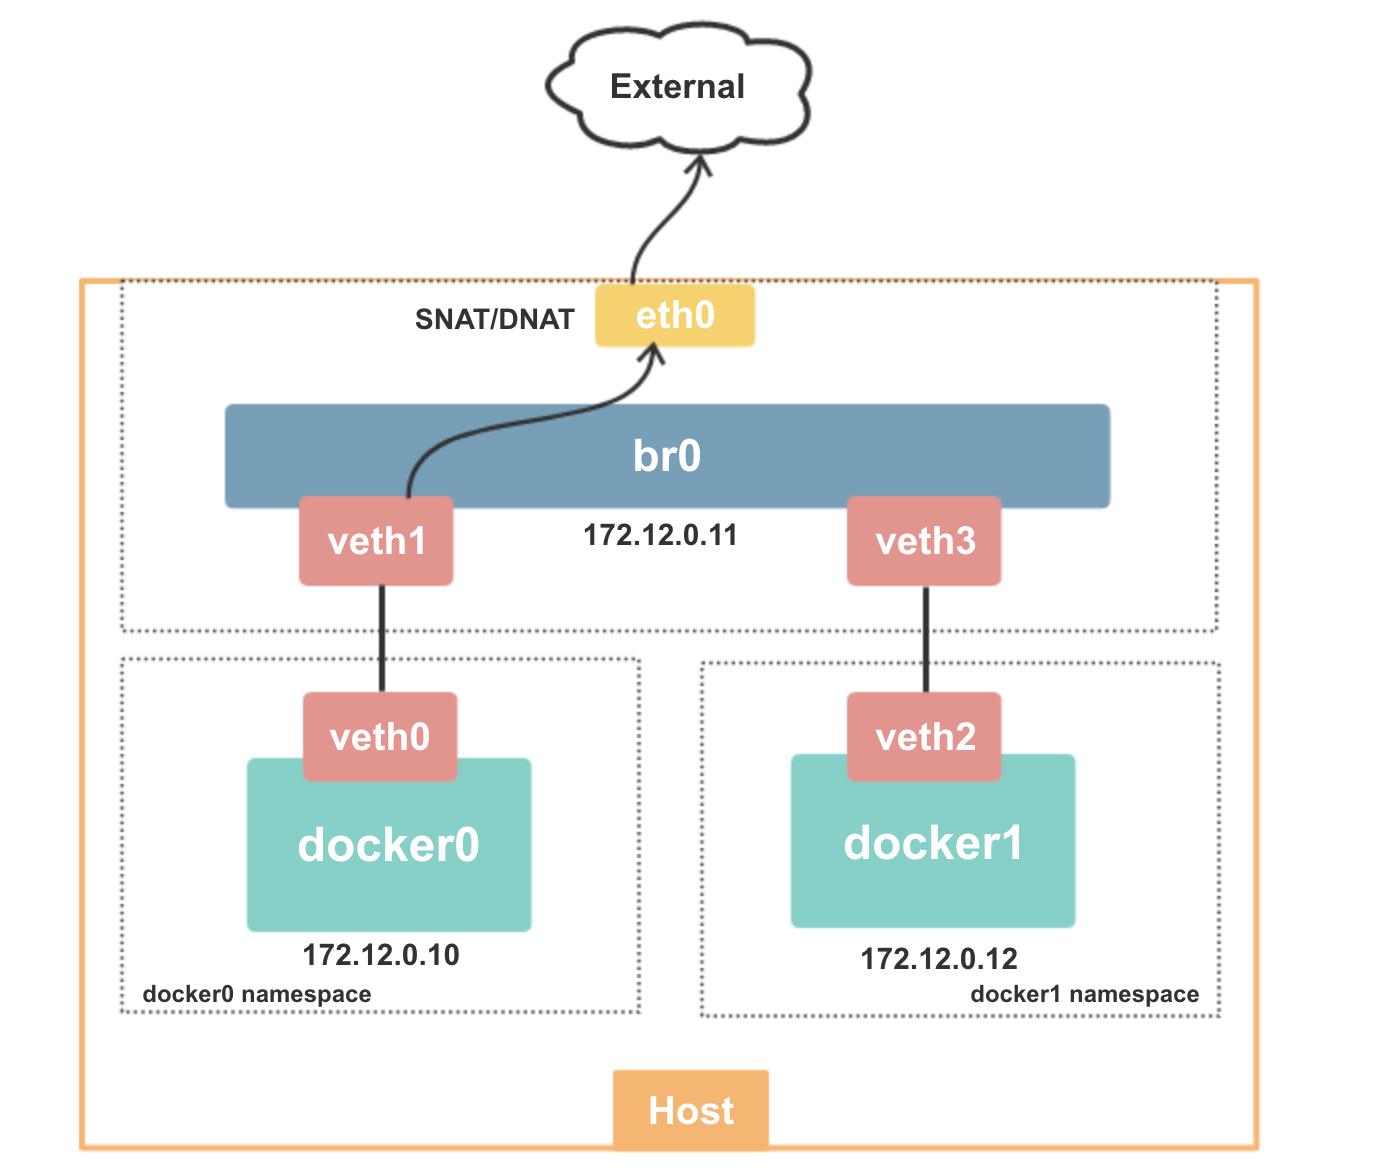 AWS/Terraform Workshop (Part 2): EC2 Networking, Autoscaling Groups